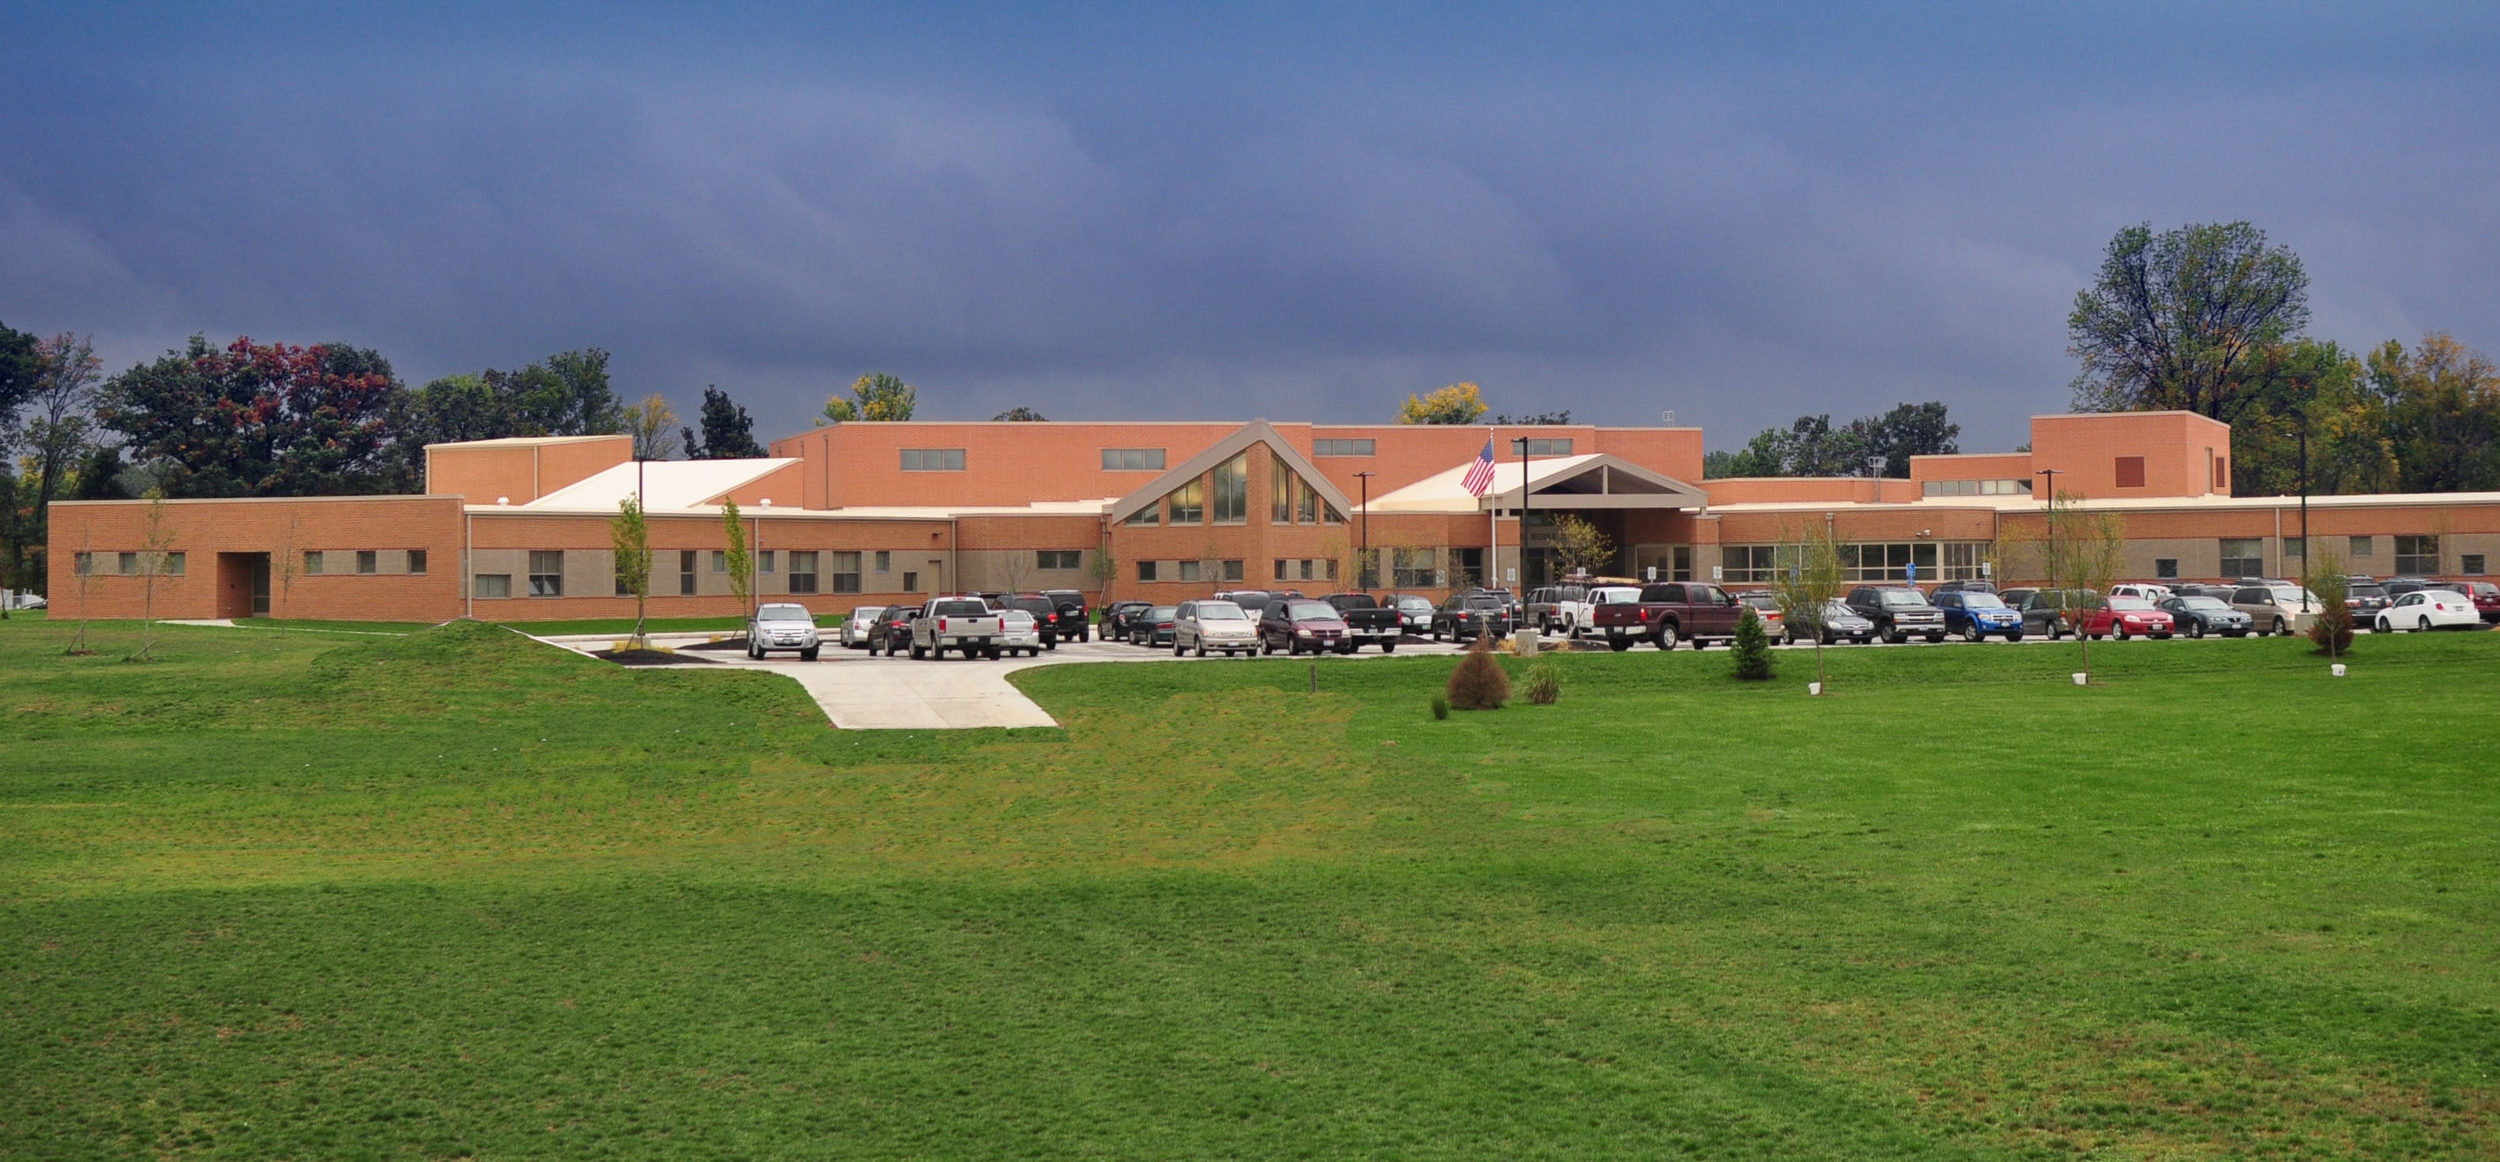 Liberty Union Thurston Middle School